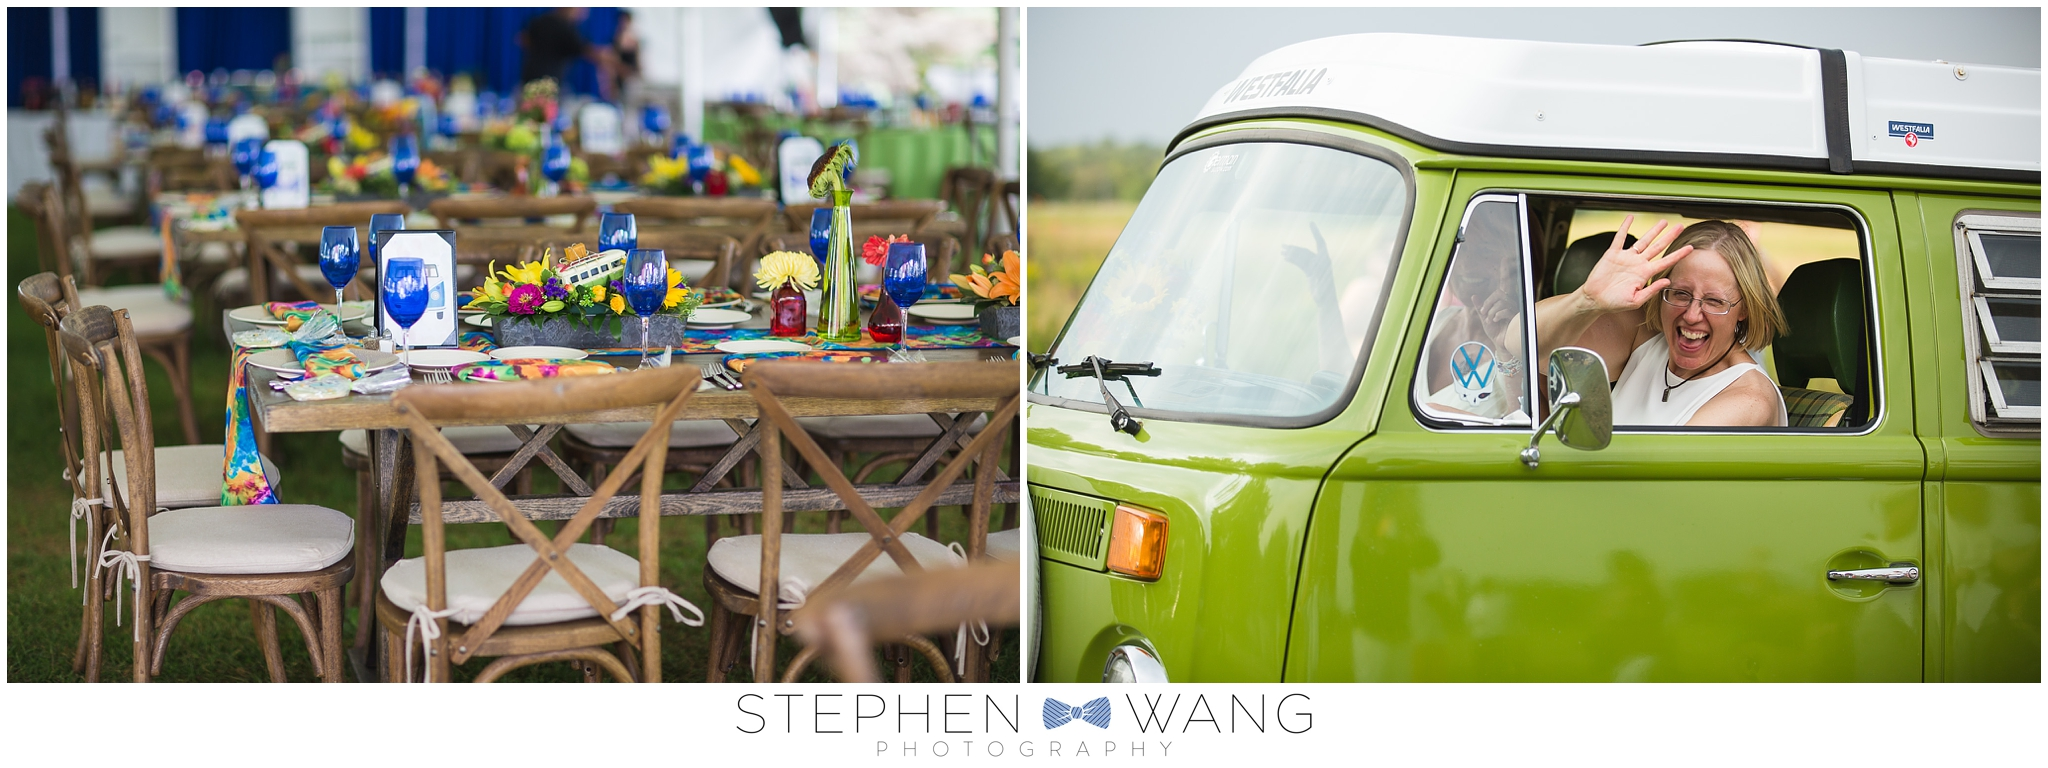 Stephen Wang Photography Wedding Photographer Connecticut CT-12-24_0015.jpg